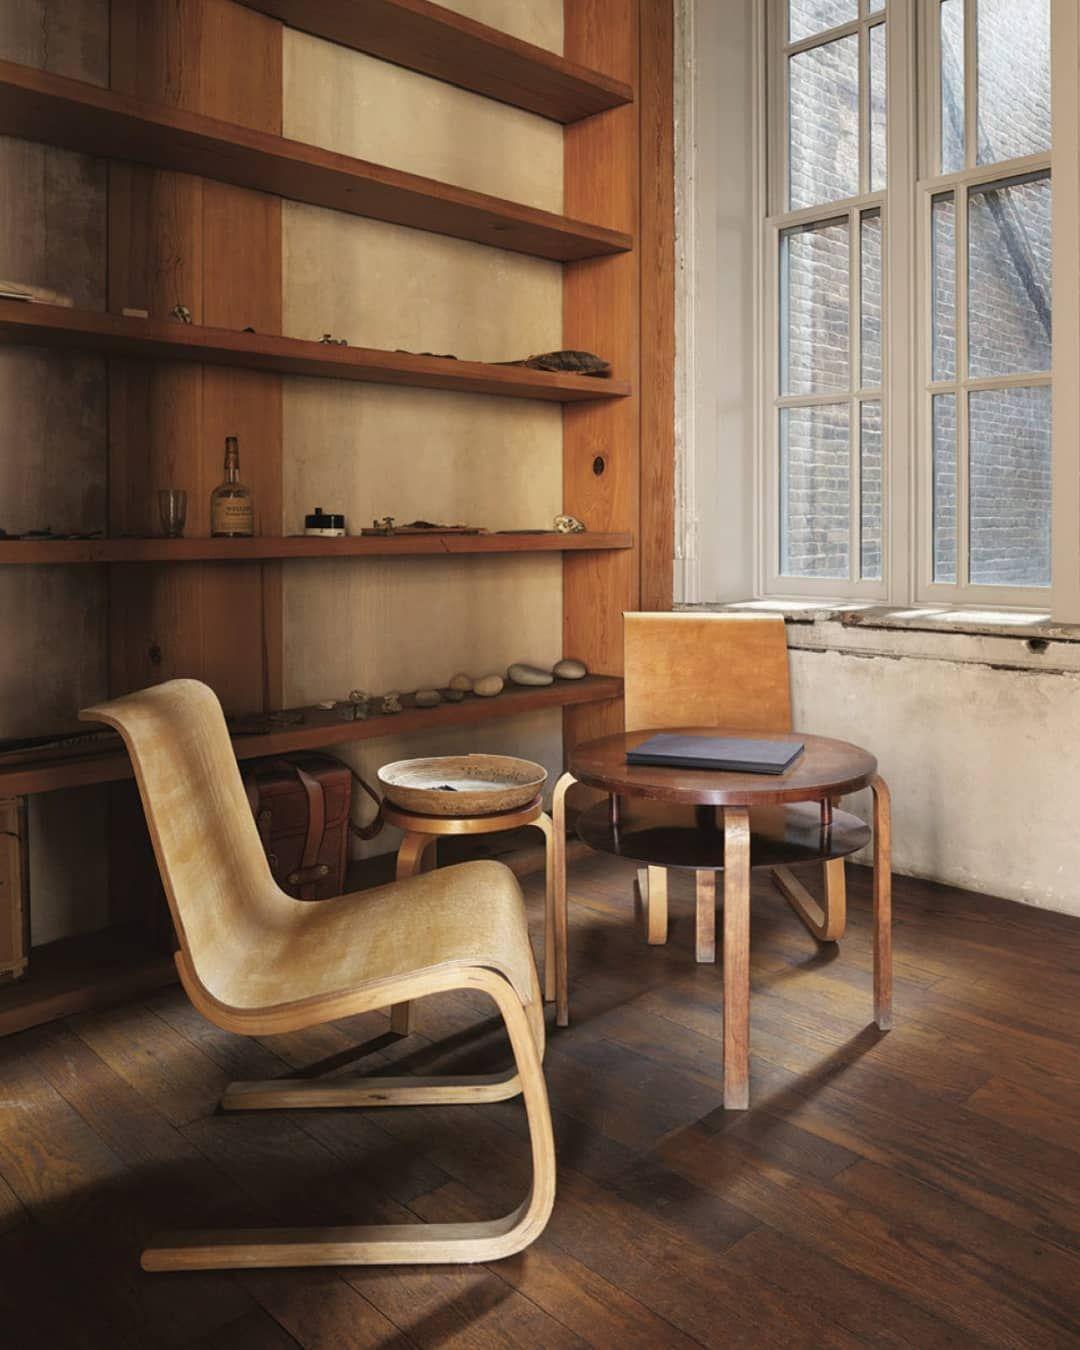 Donald Judd Minimal Furniture Interior Minimalism Interior